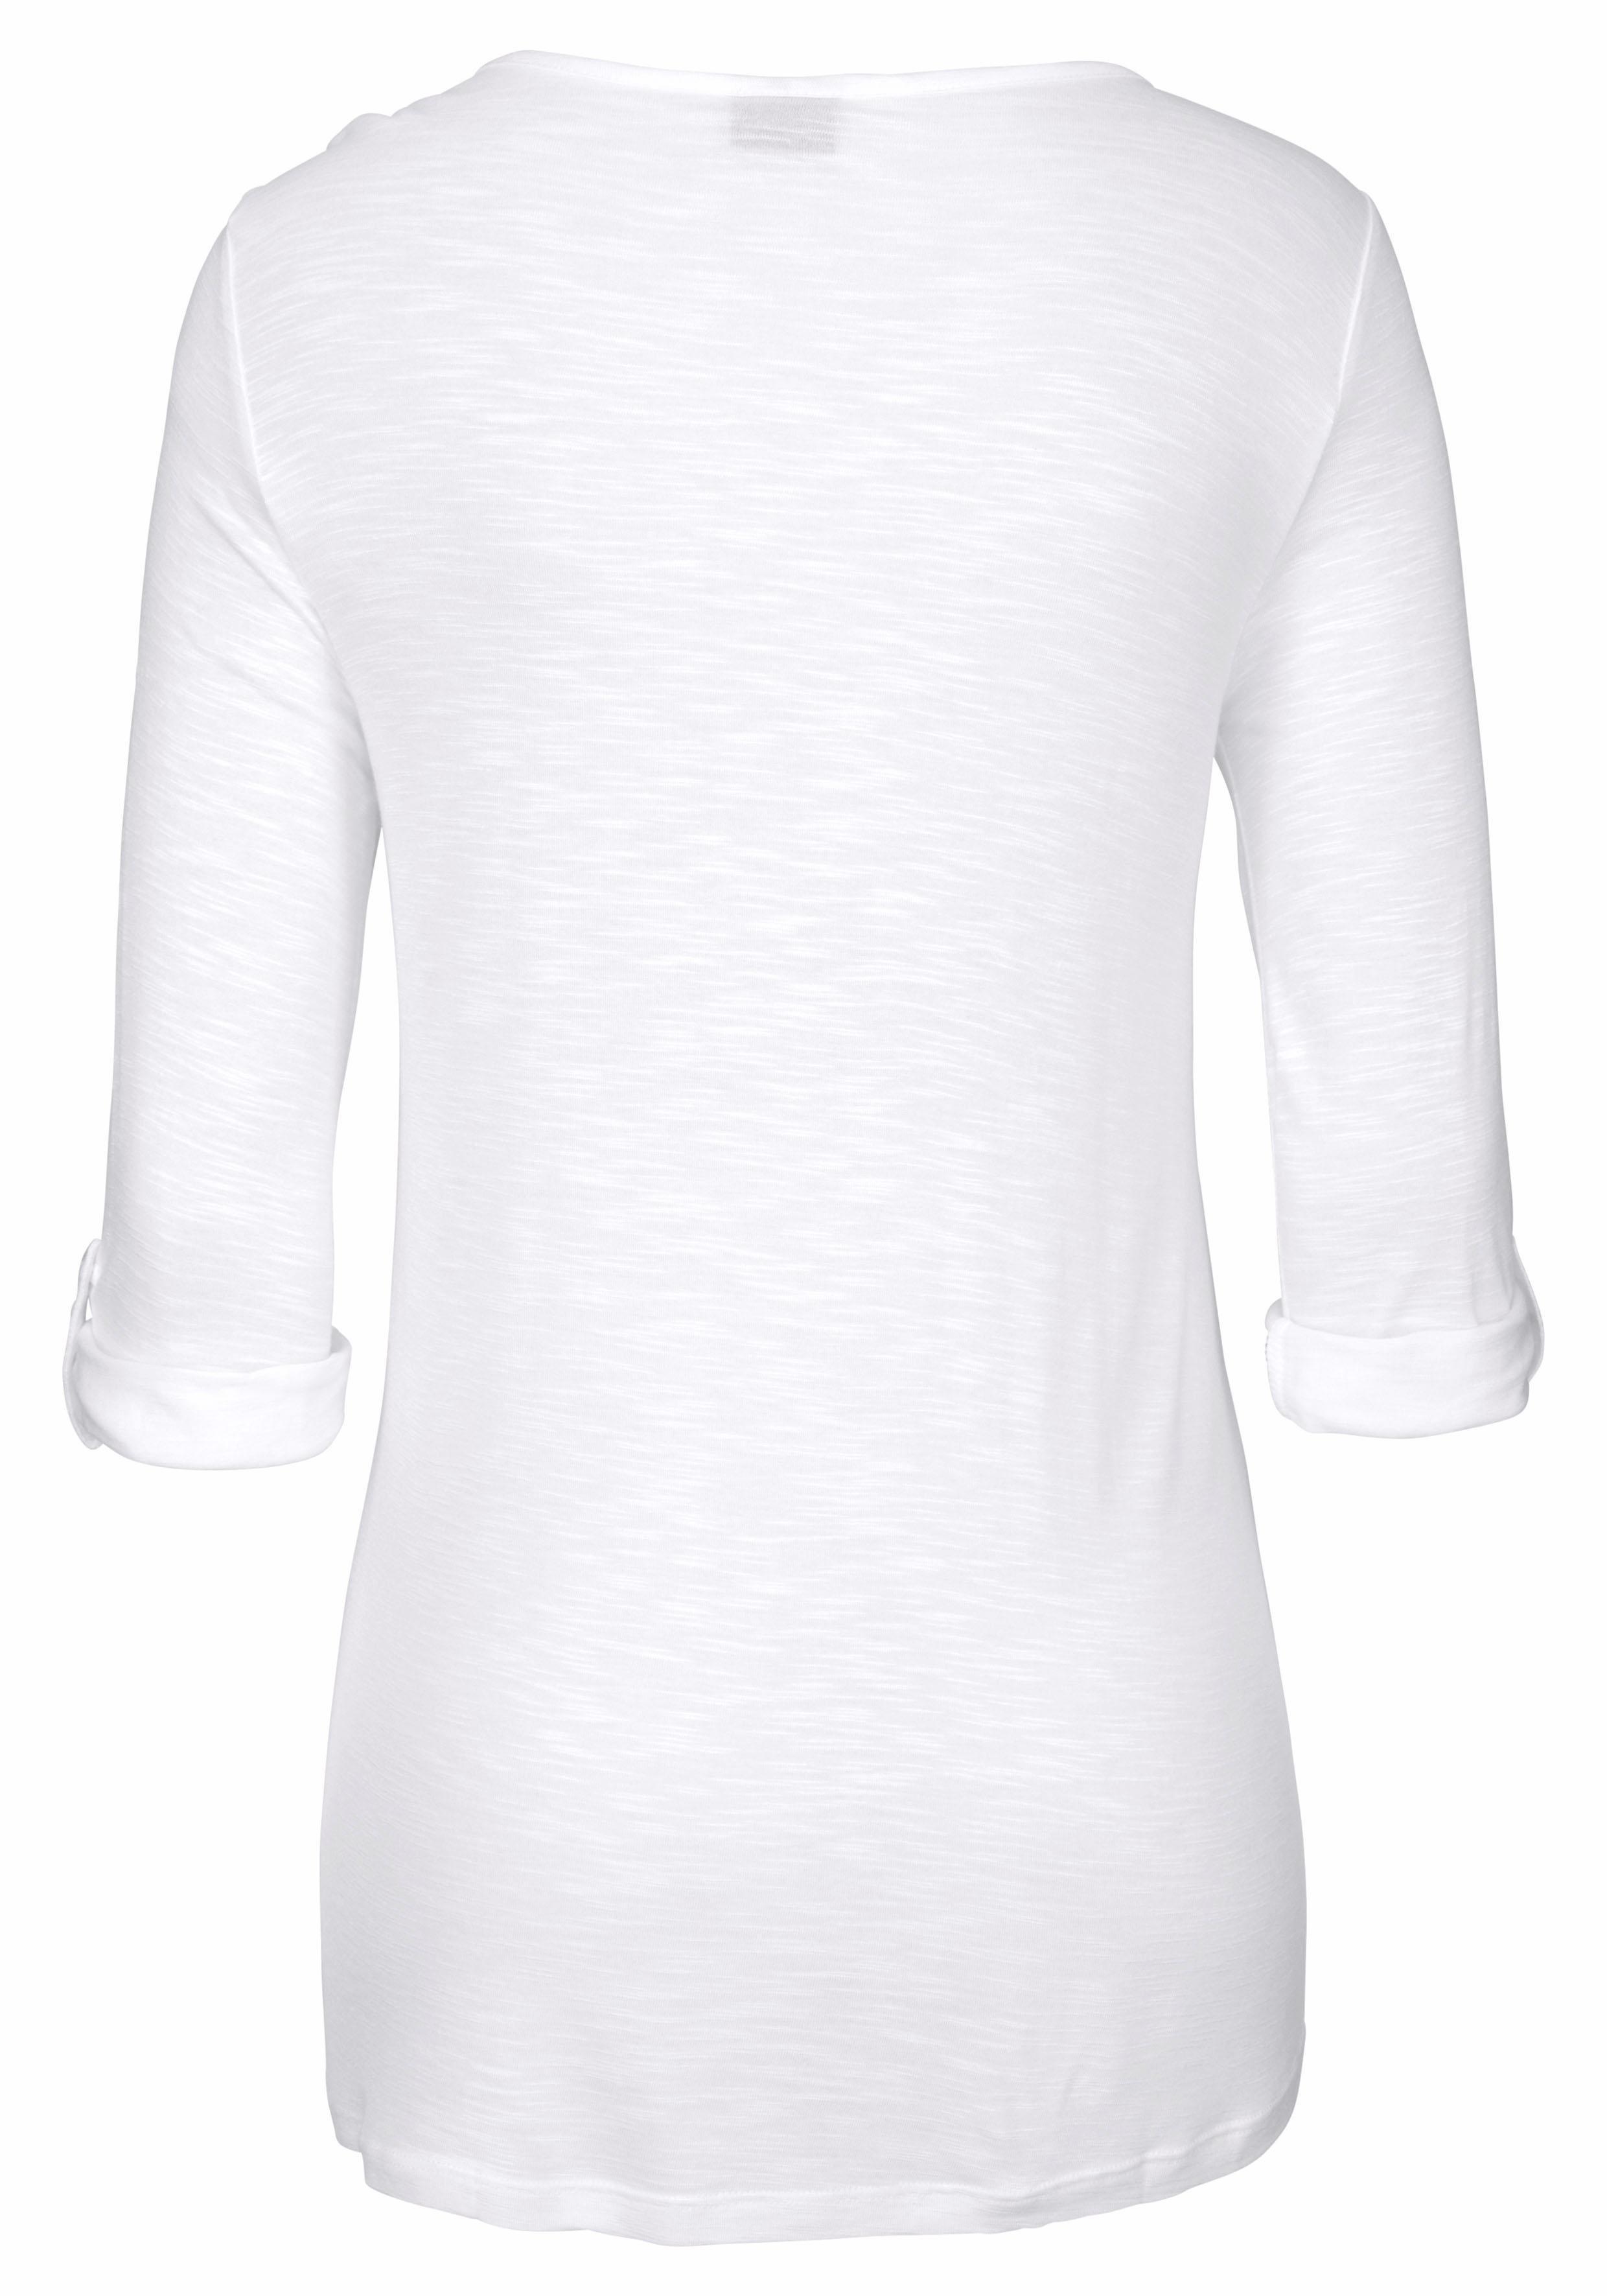 Lascana Nu Strandshirt Bestellen Lascana Nu Online Strandshirt 9EYWH2DI